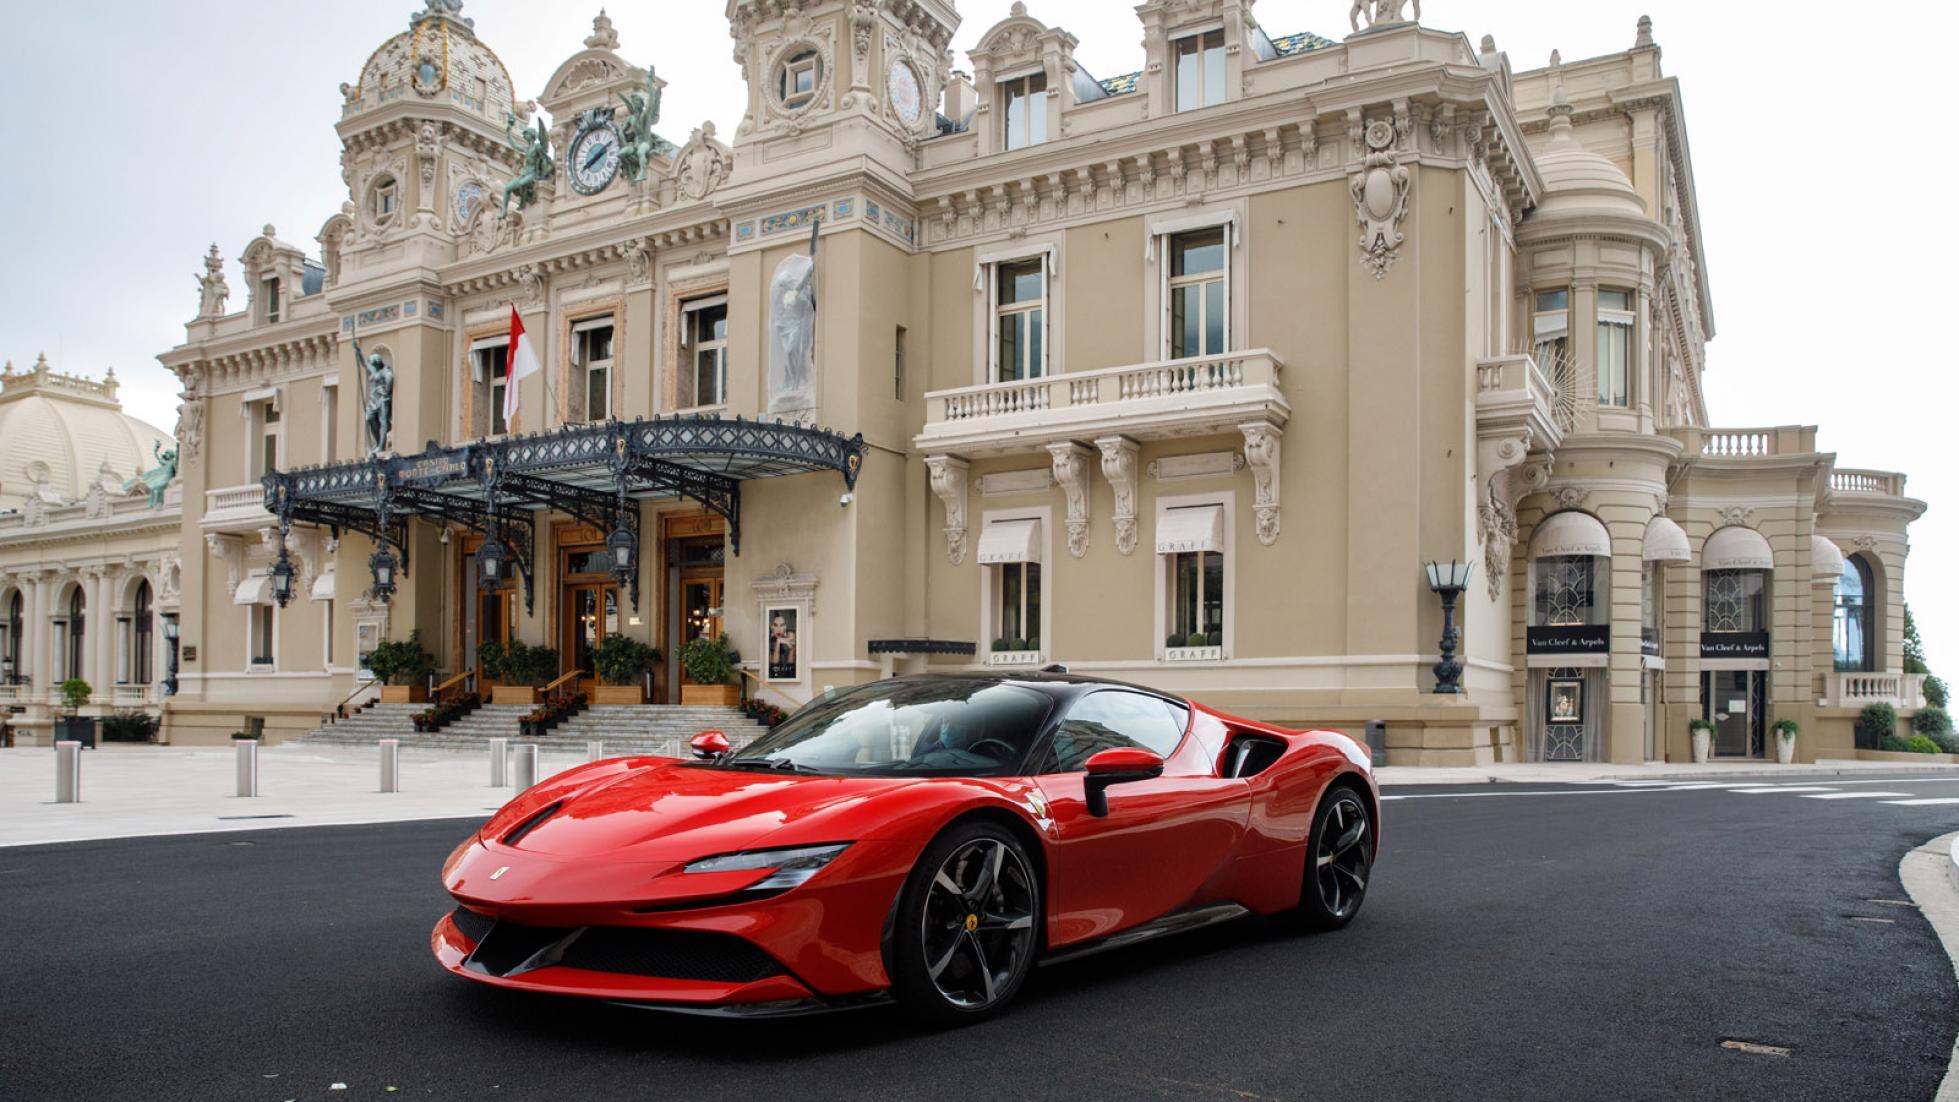 Charles-Leclerc-Ferrari-SF90-Stradale-Monaco-8